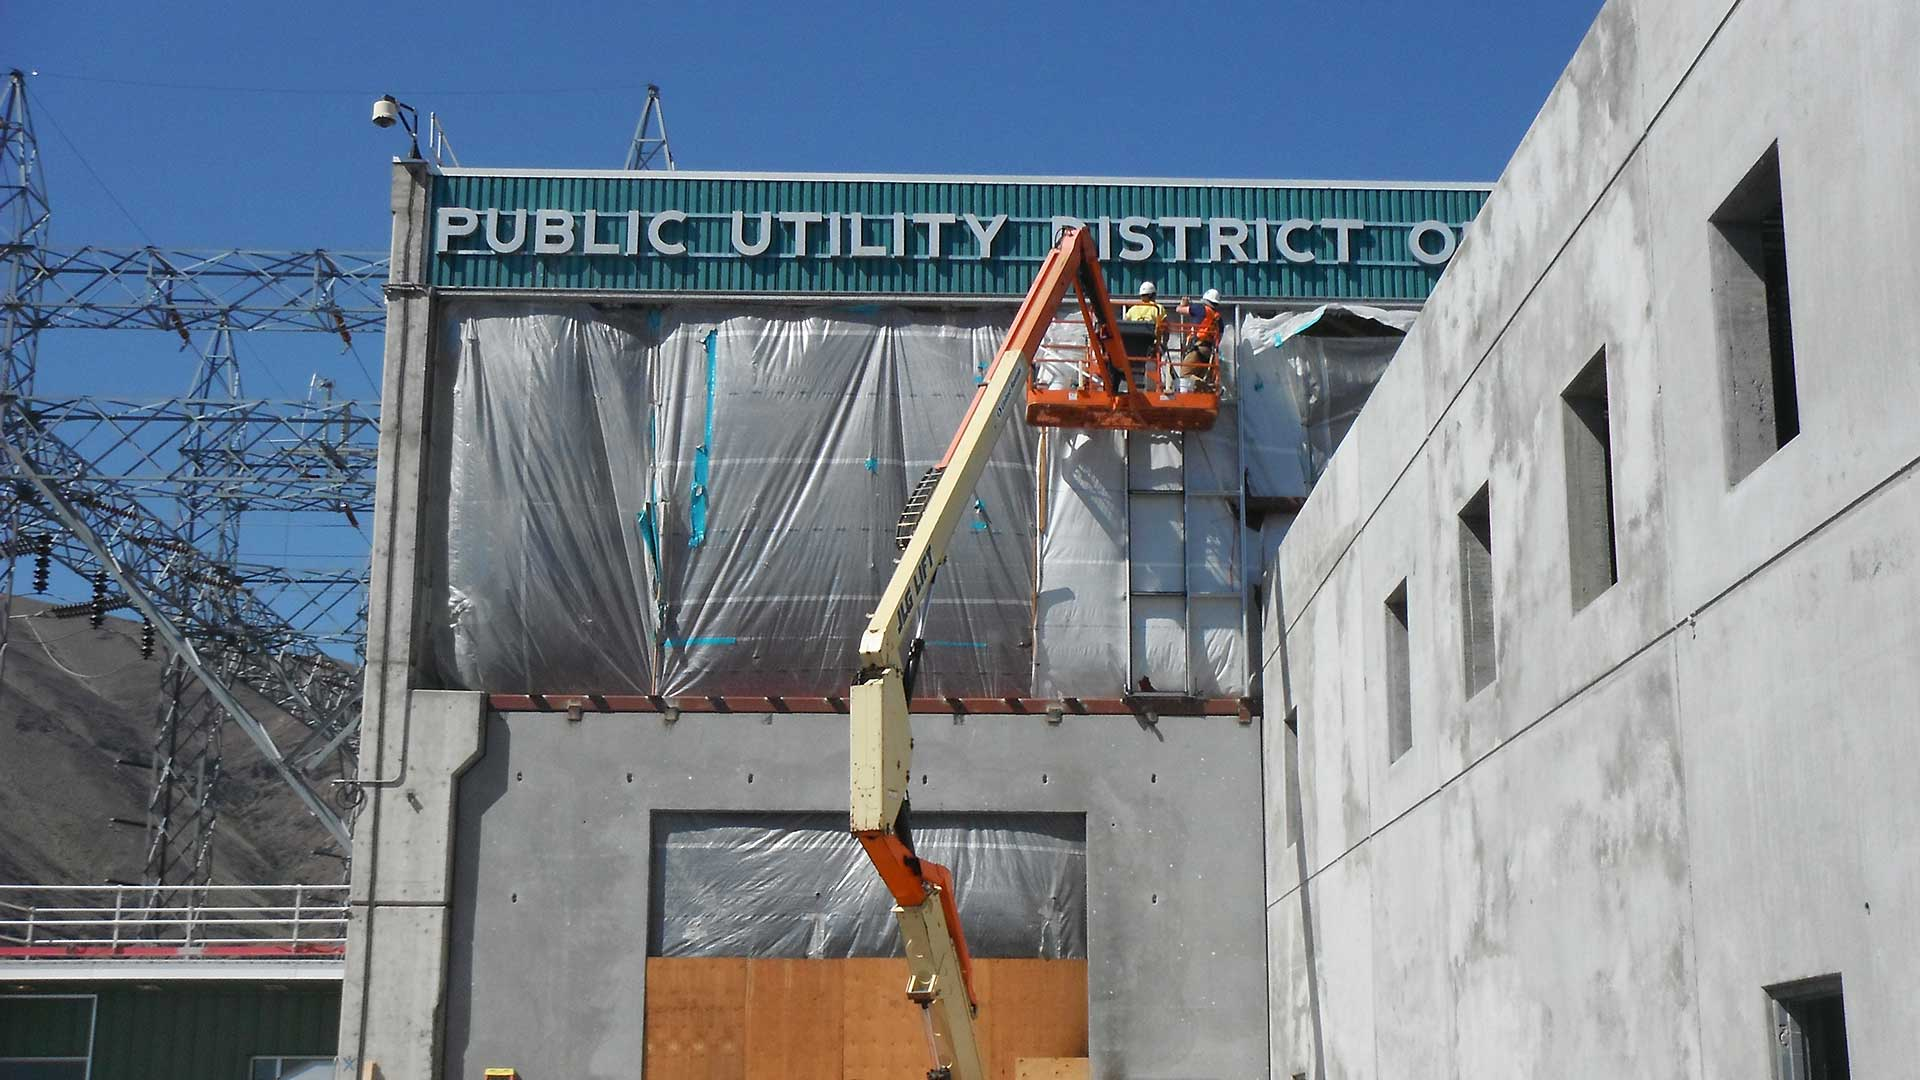 Priest Rapids Turbine Generator Building - construction